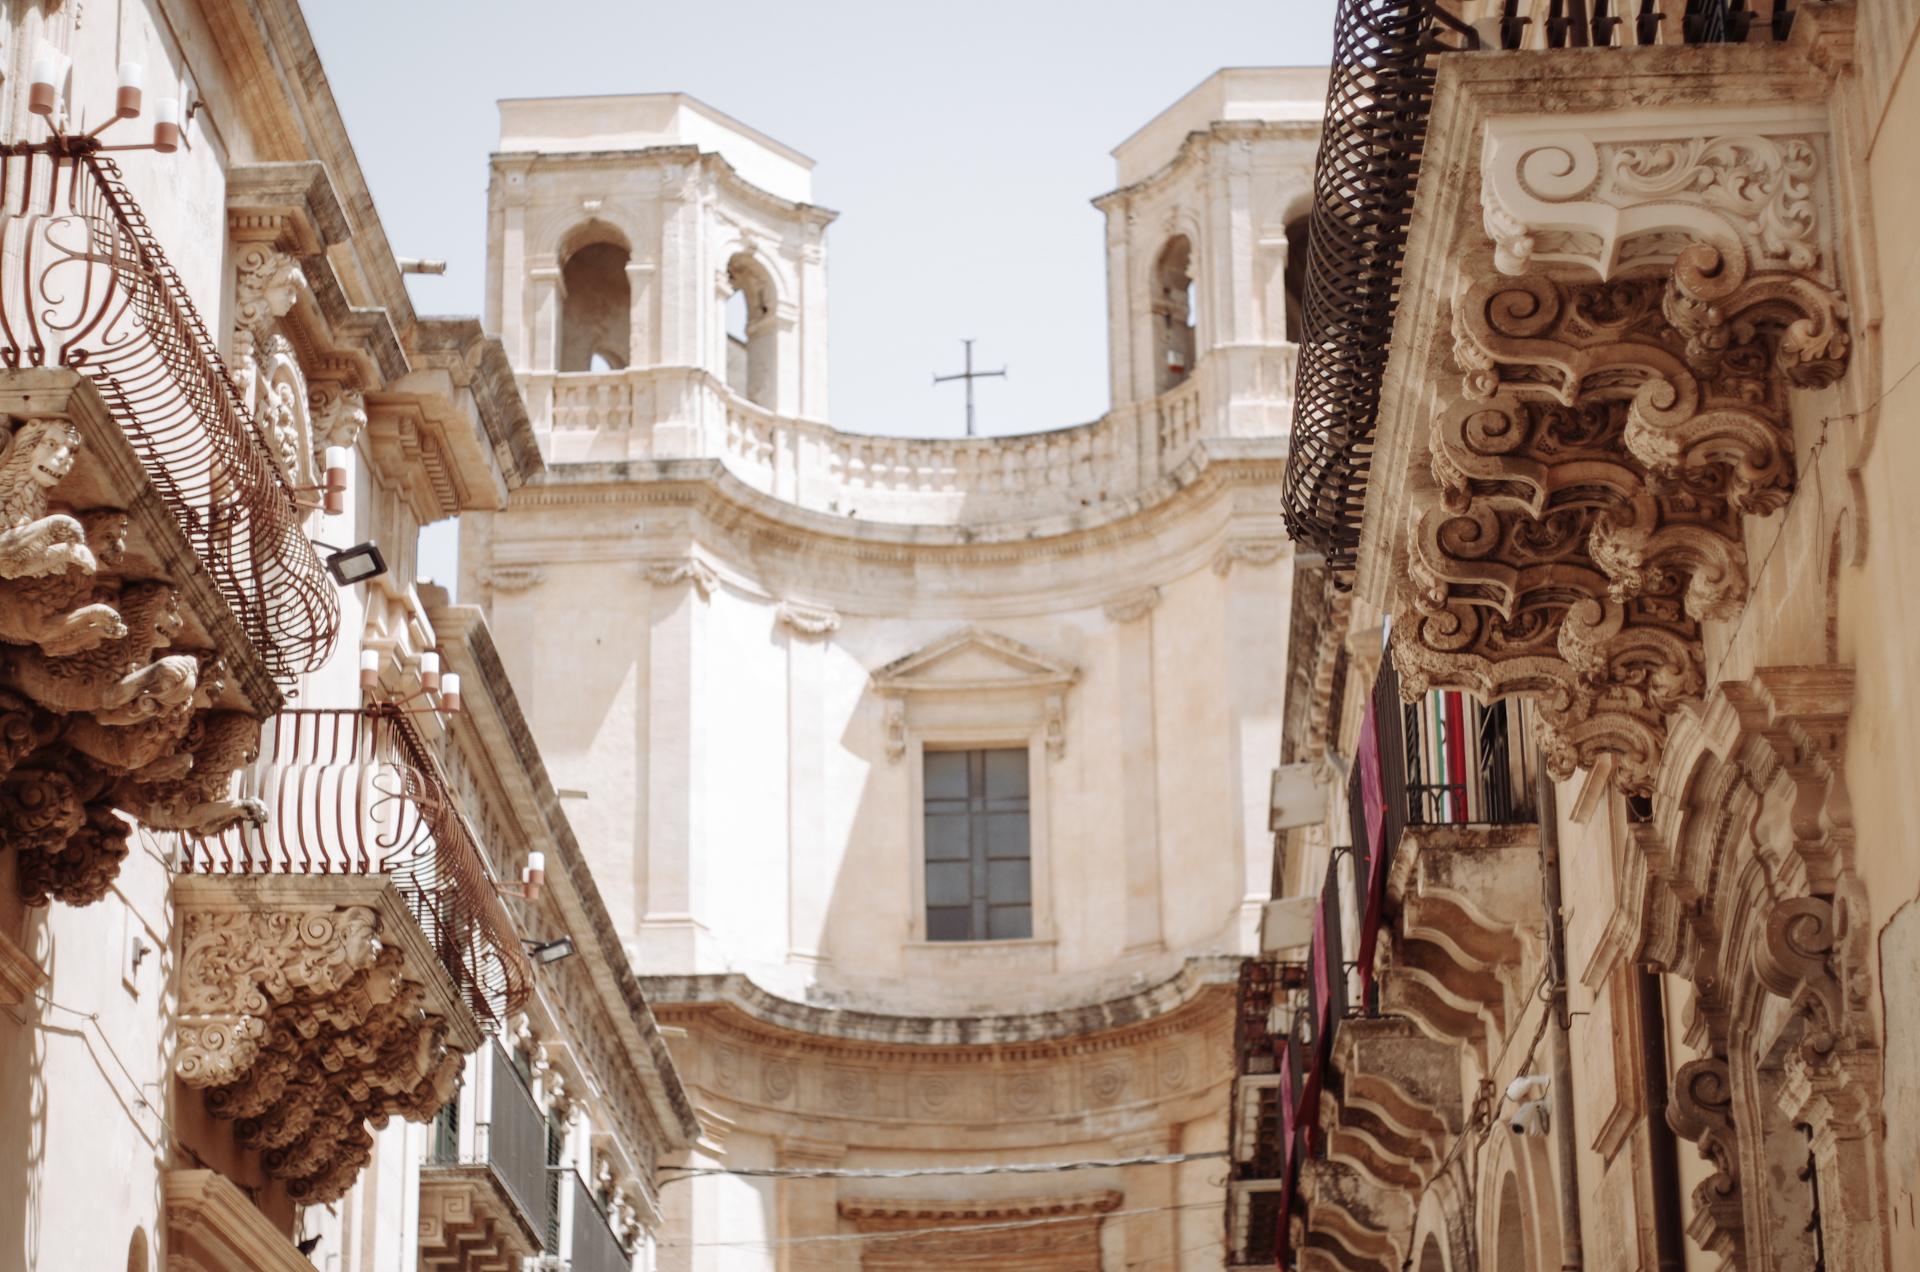 SICILY - Noto